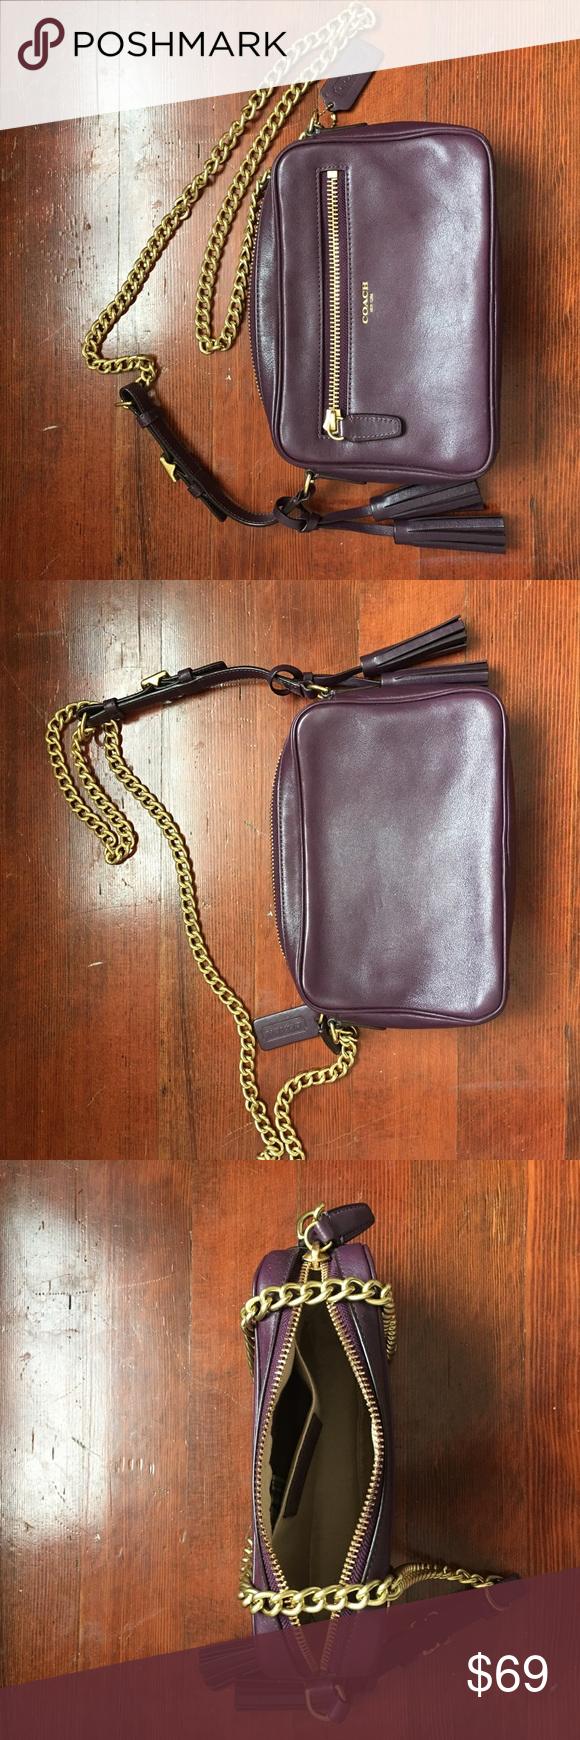 Cross body purse Gold chain cross body purse, dark purple smooth leather, front zipper pocket, plus inner pocket as well. Coach Bags Crossbody Bags